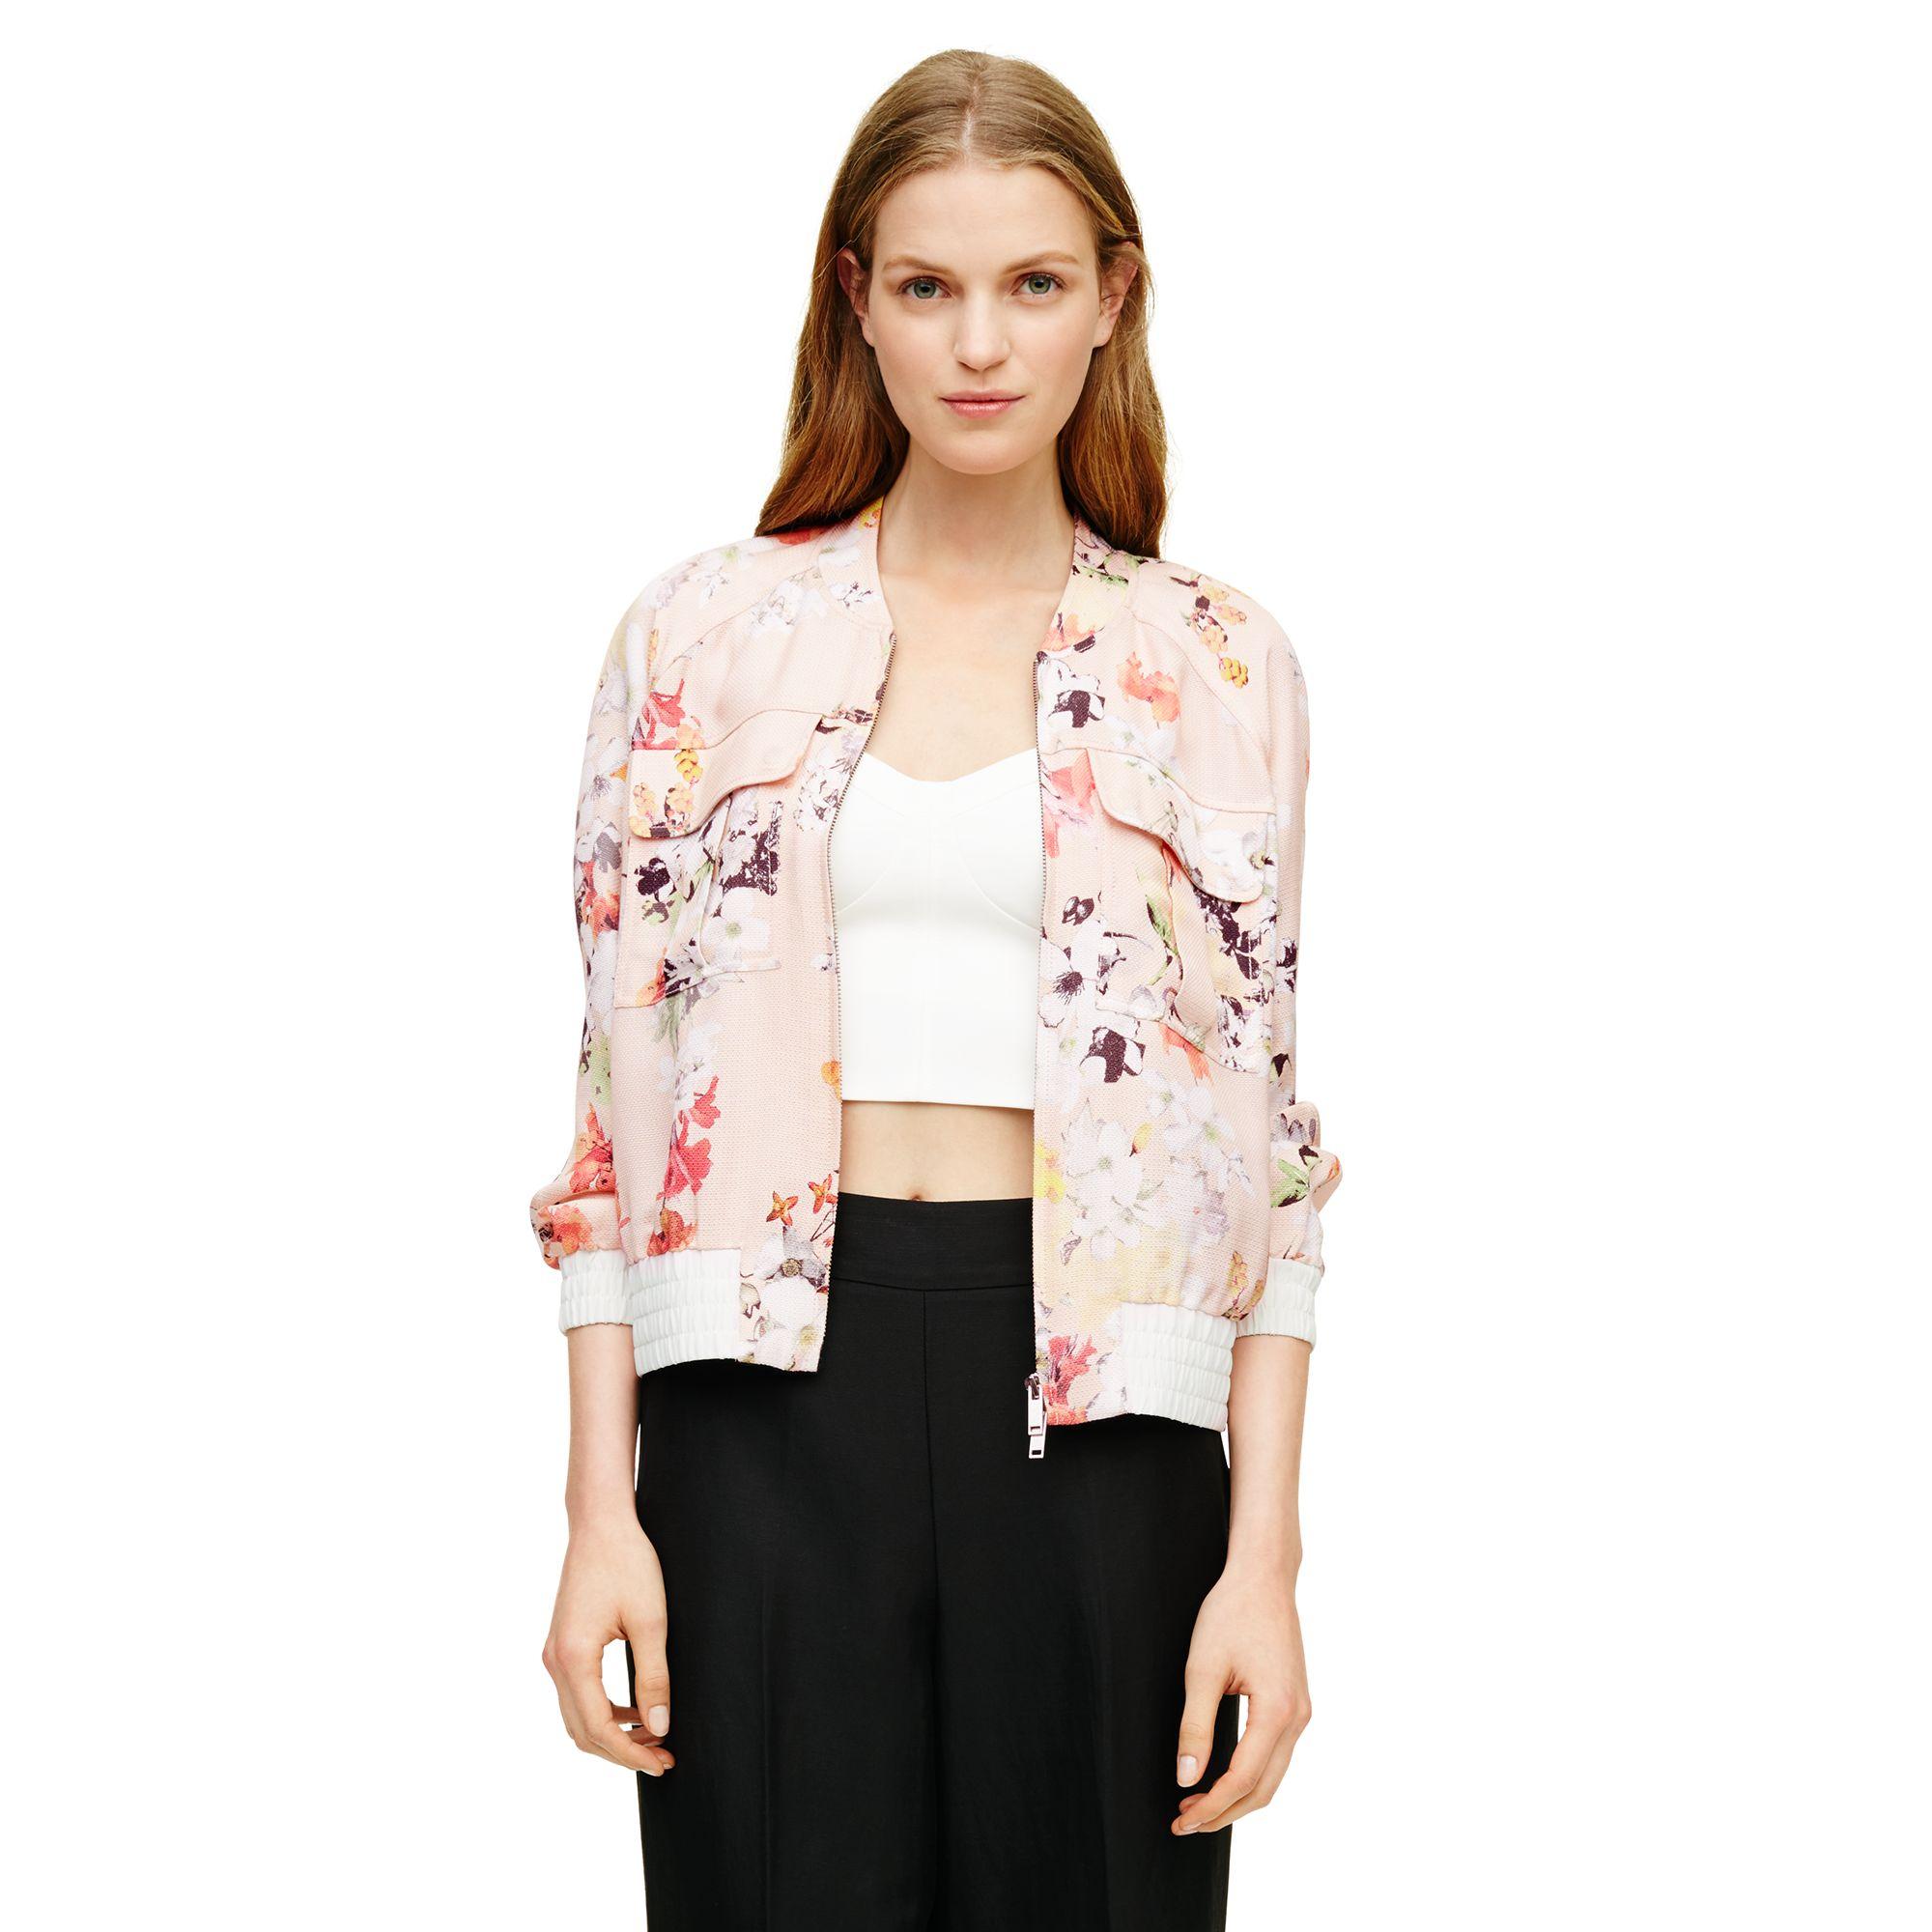 Pink floral bomber jacket – Modern fashion jacket photo blog